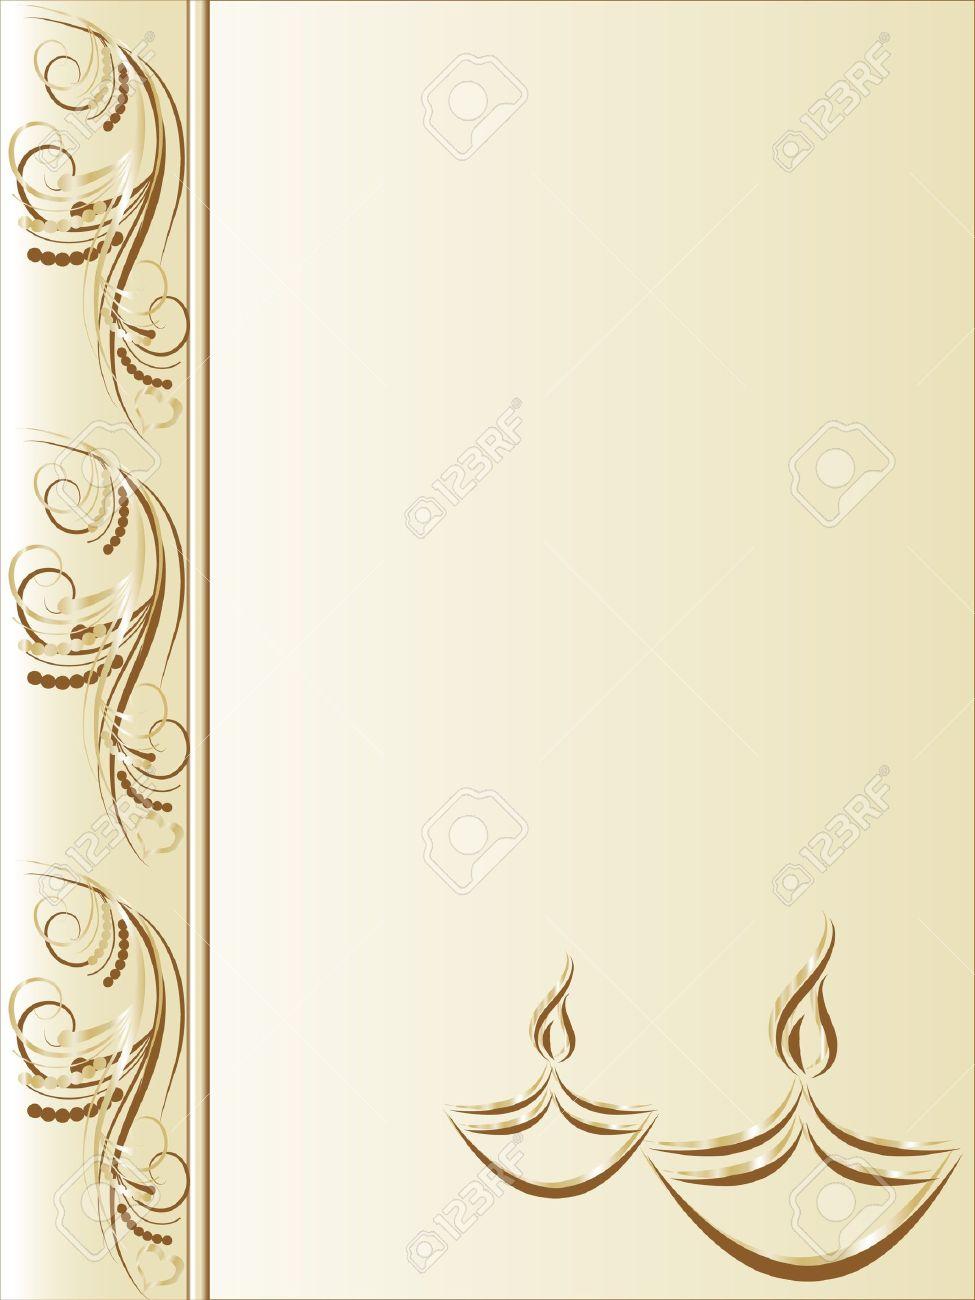 Elegant greeting card with diwali lamps royalty free cliparts elegant greeting card with diwali lamps stock vector 10829486 m4hsunfo